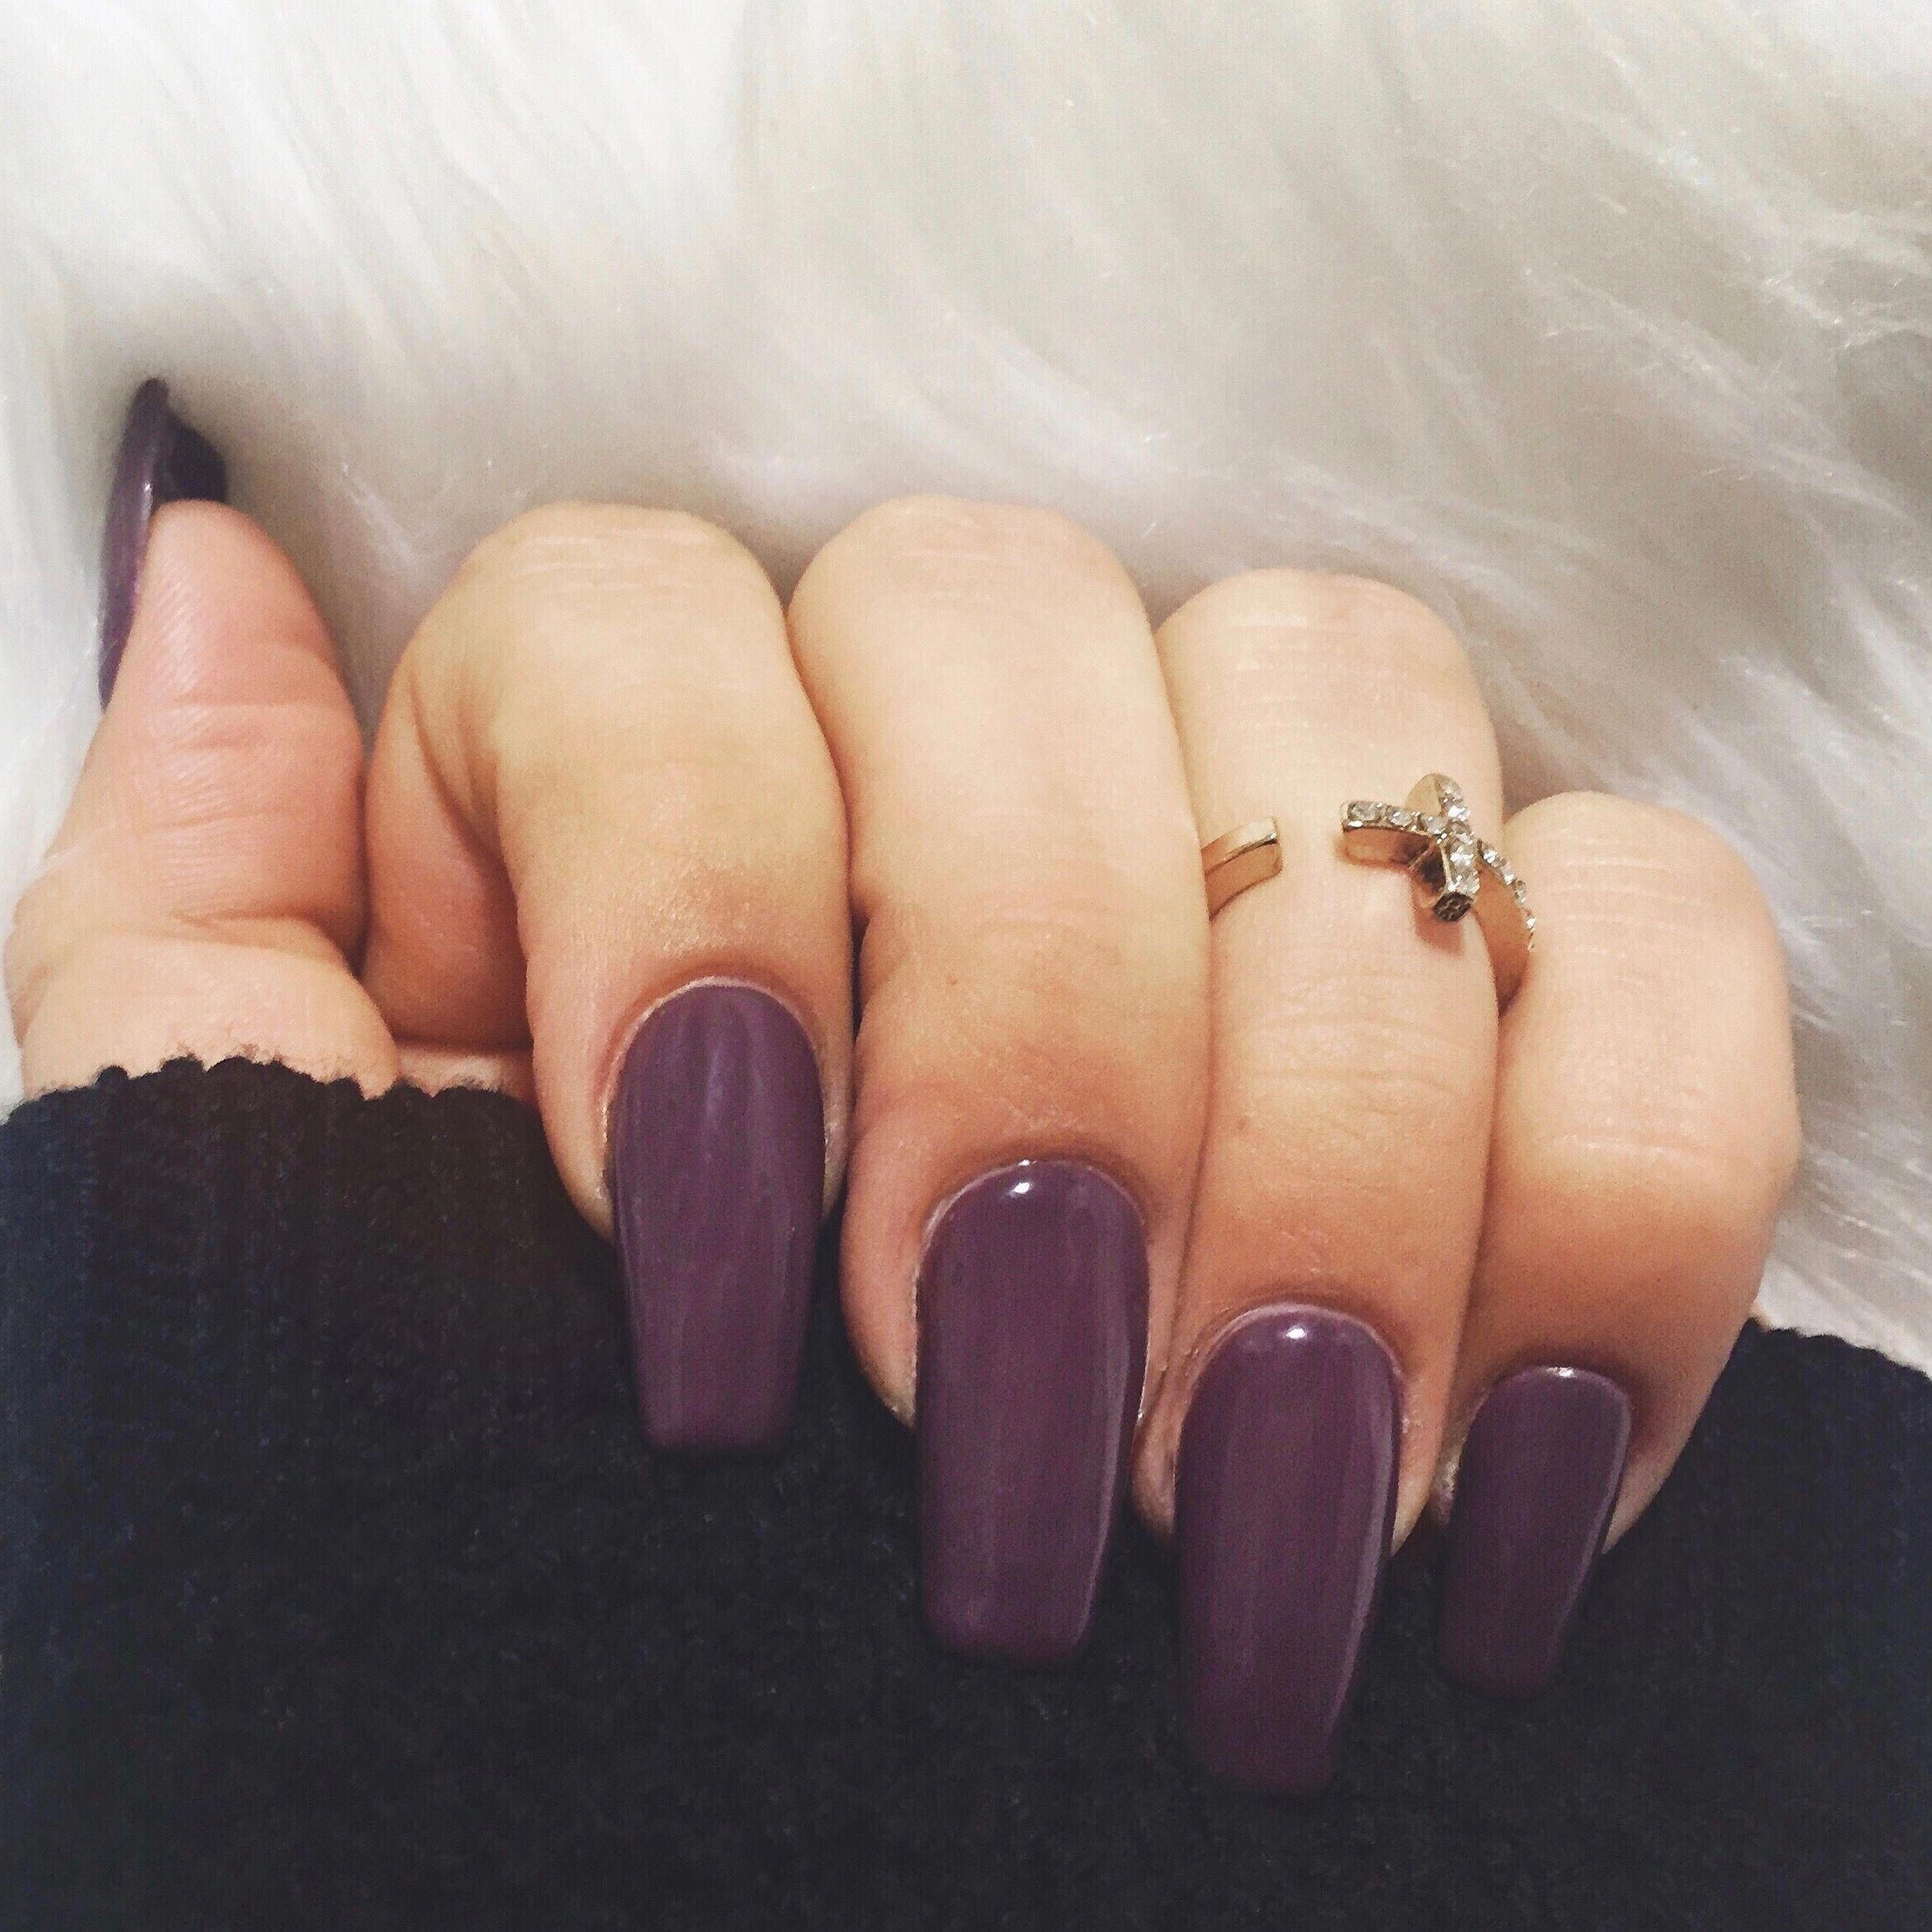 Dark Purple Fall Nails Purple Acrylic Nails Manicure Ideas Manicure Inspo Midi Ring Acrylicnail Purple Acrylic Nails Dark Purple Nails Fall Acrylic Nails